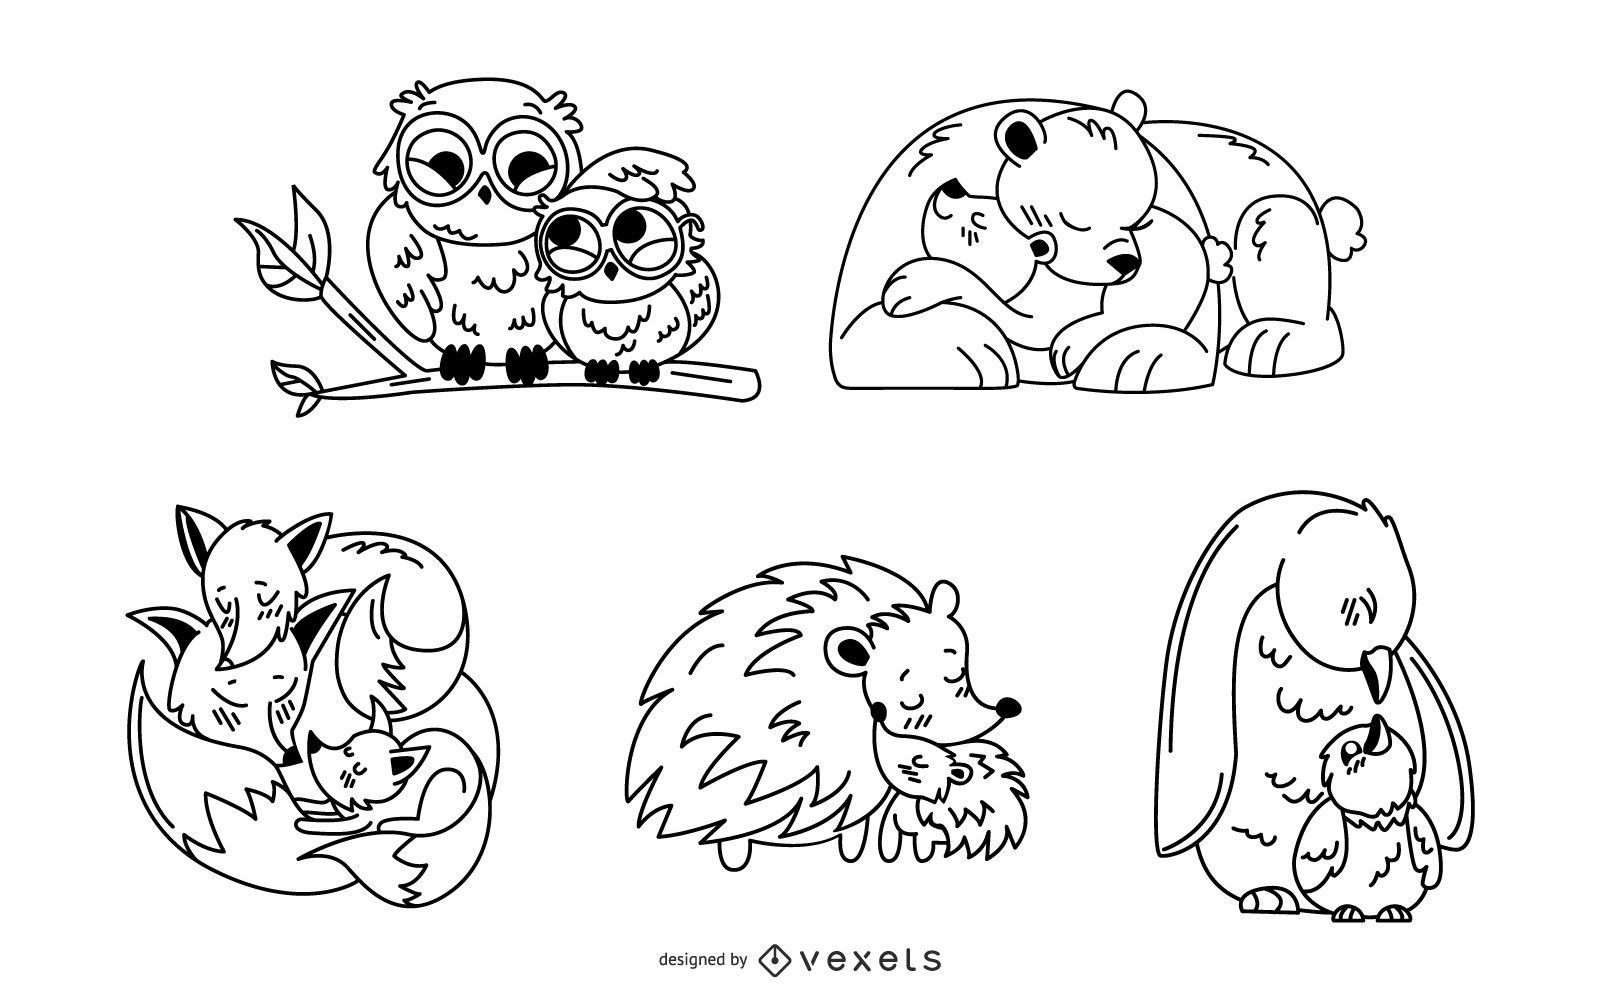 Paquete de diseño de trazo de mamá animal